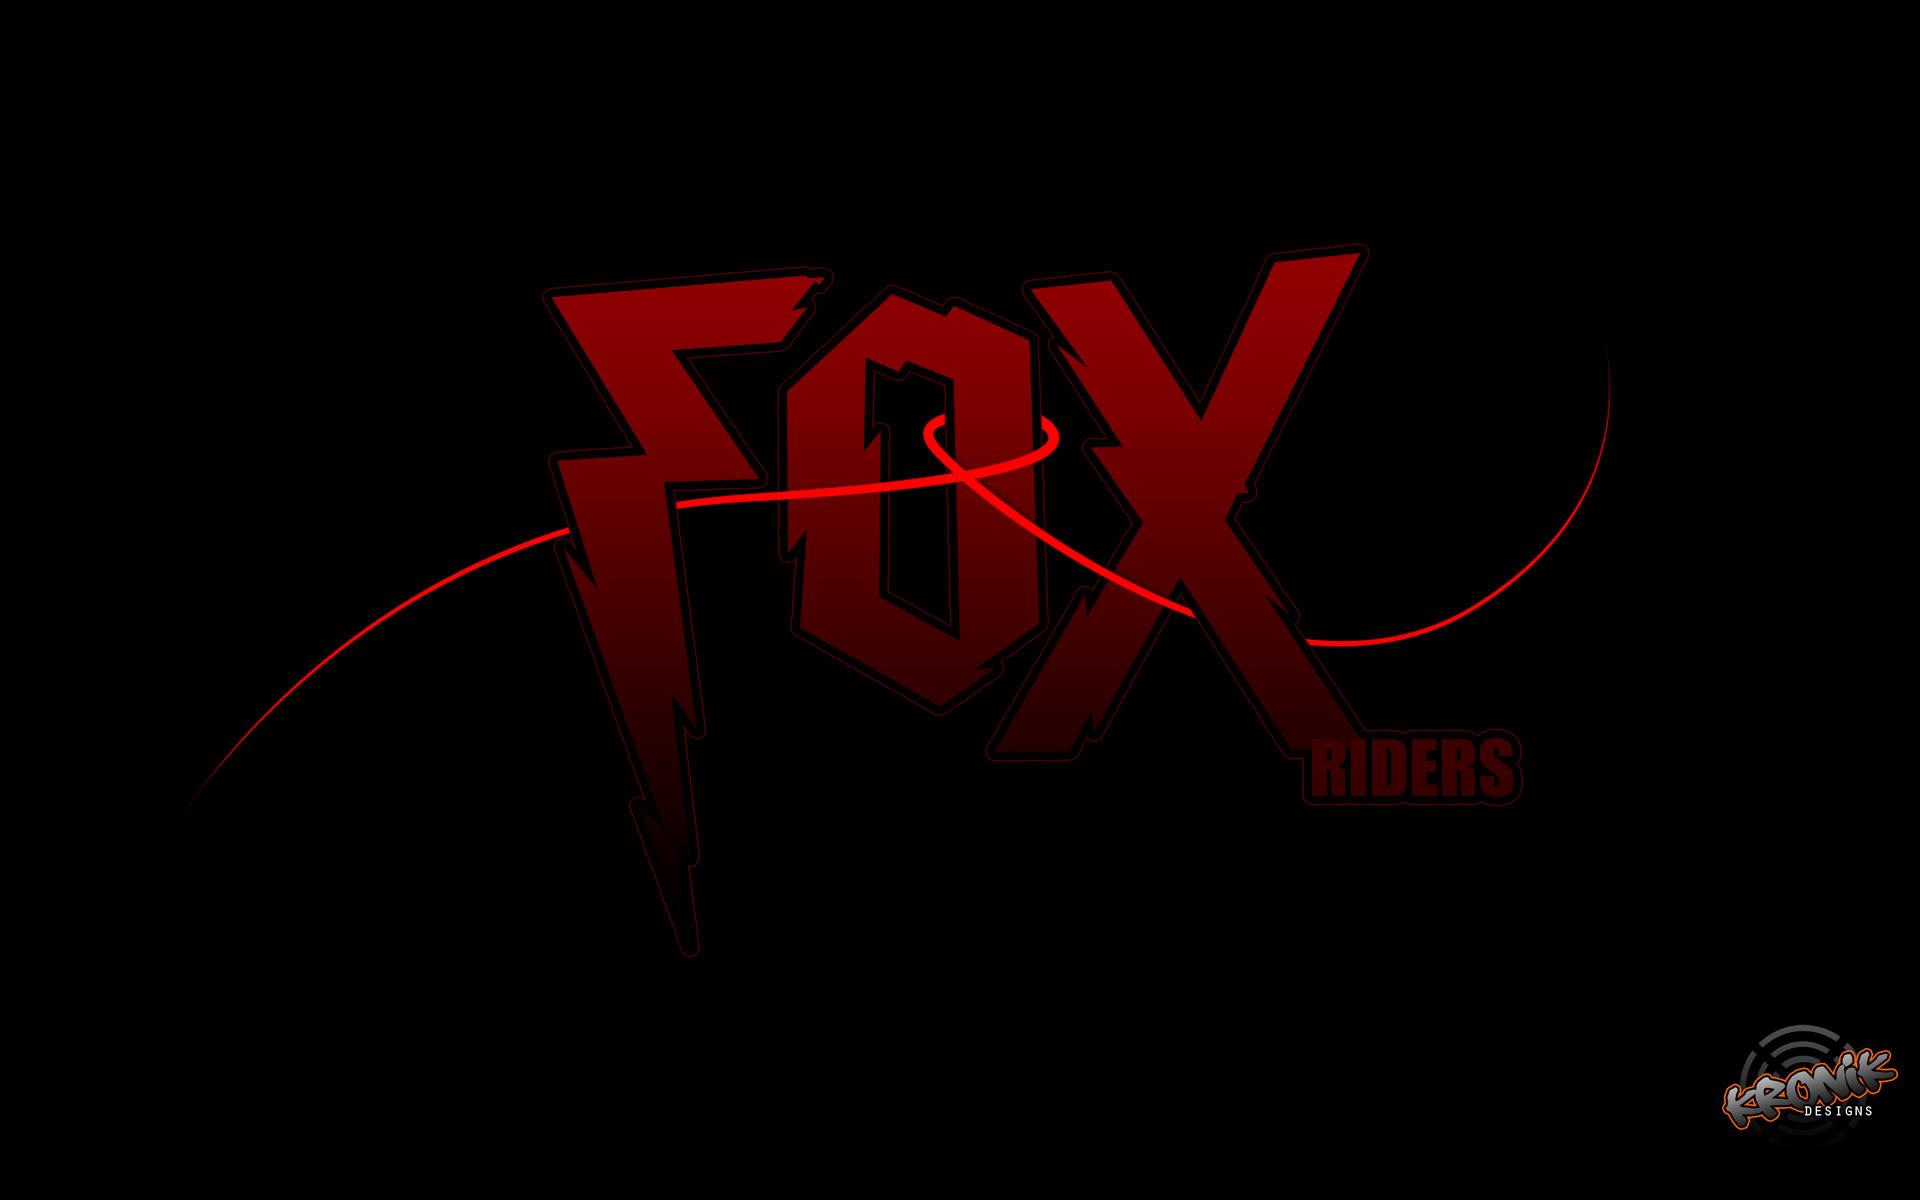 Top Wallpaper Logo Fox Racing - zUHdib  Graphic_543225.jpg